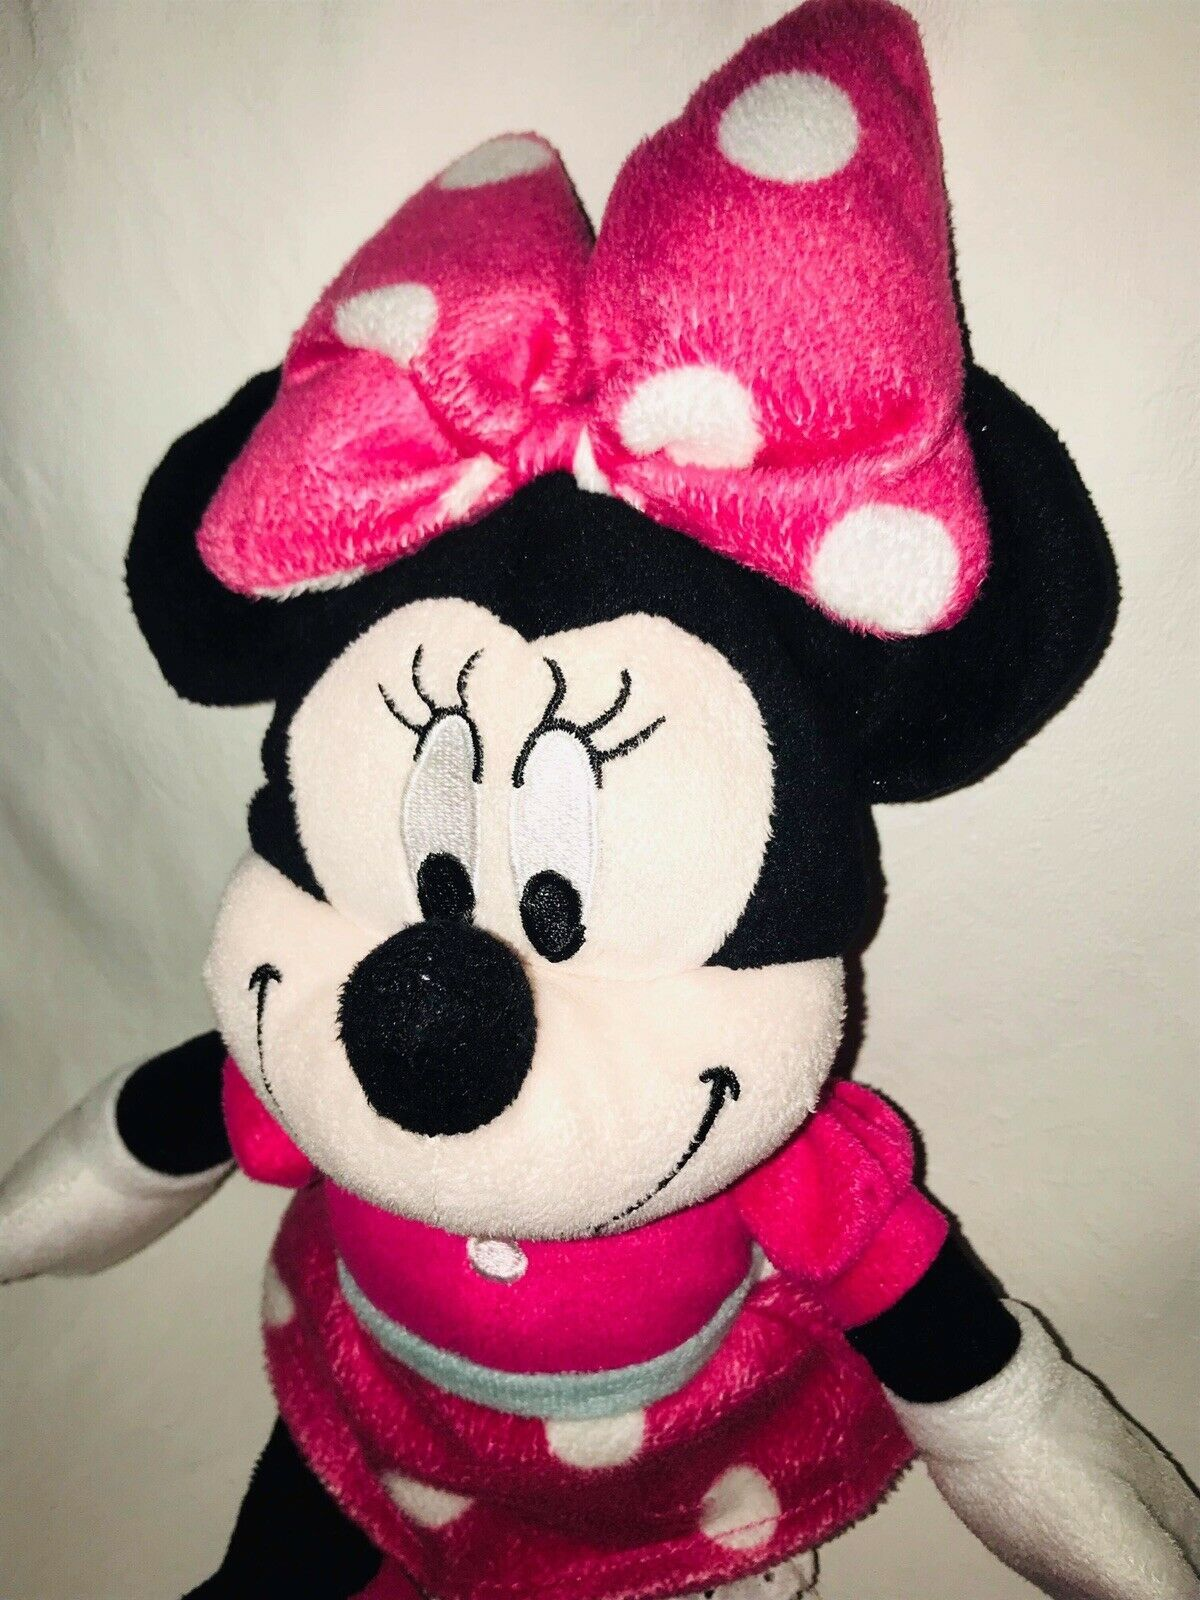 "Disney Minnie Mouse Plush Pink Polka Dot  Stuffed Animal Doll 15"" image 3"